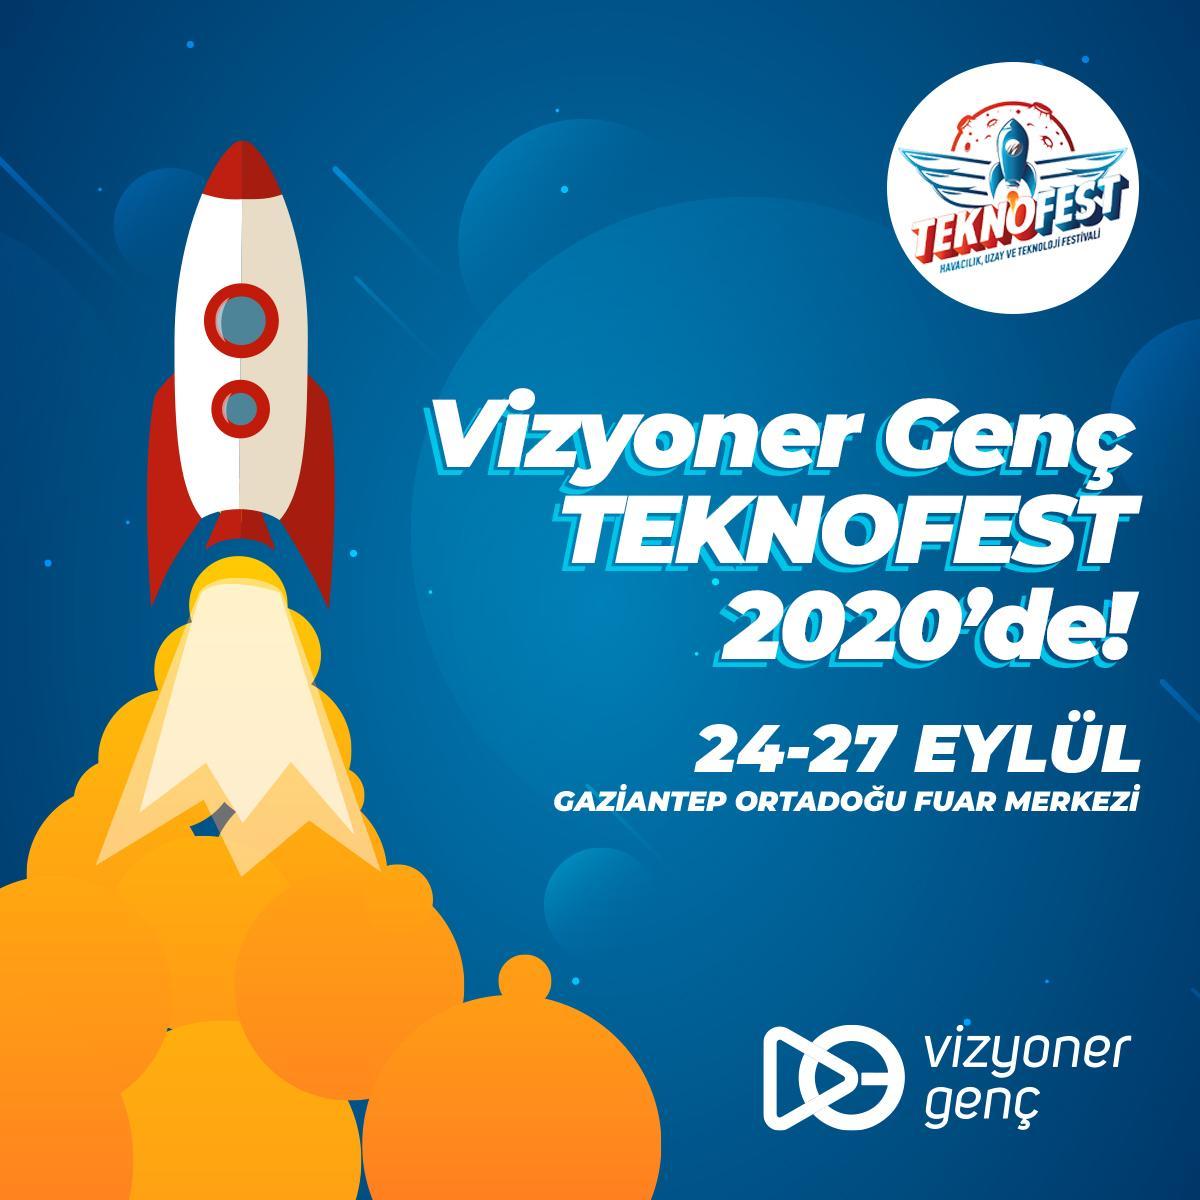 Vizyoner Genç TEKNOFEST 2020'de!